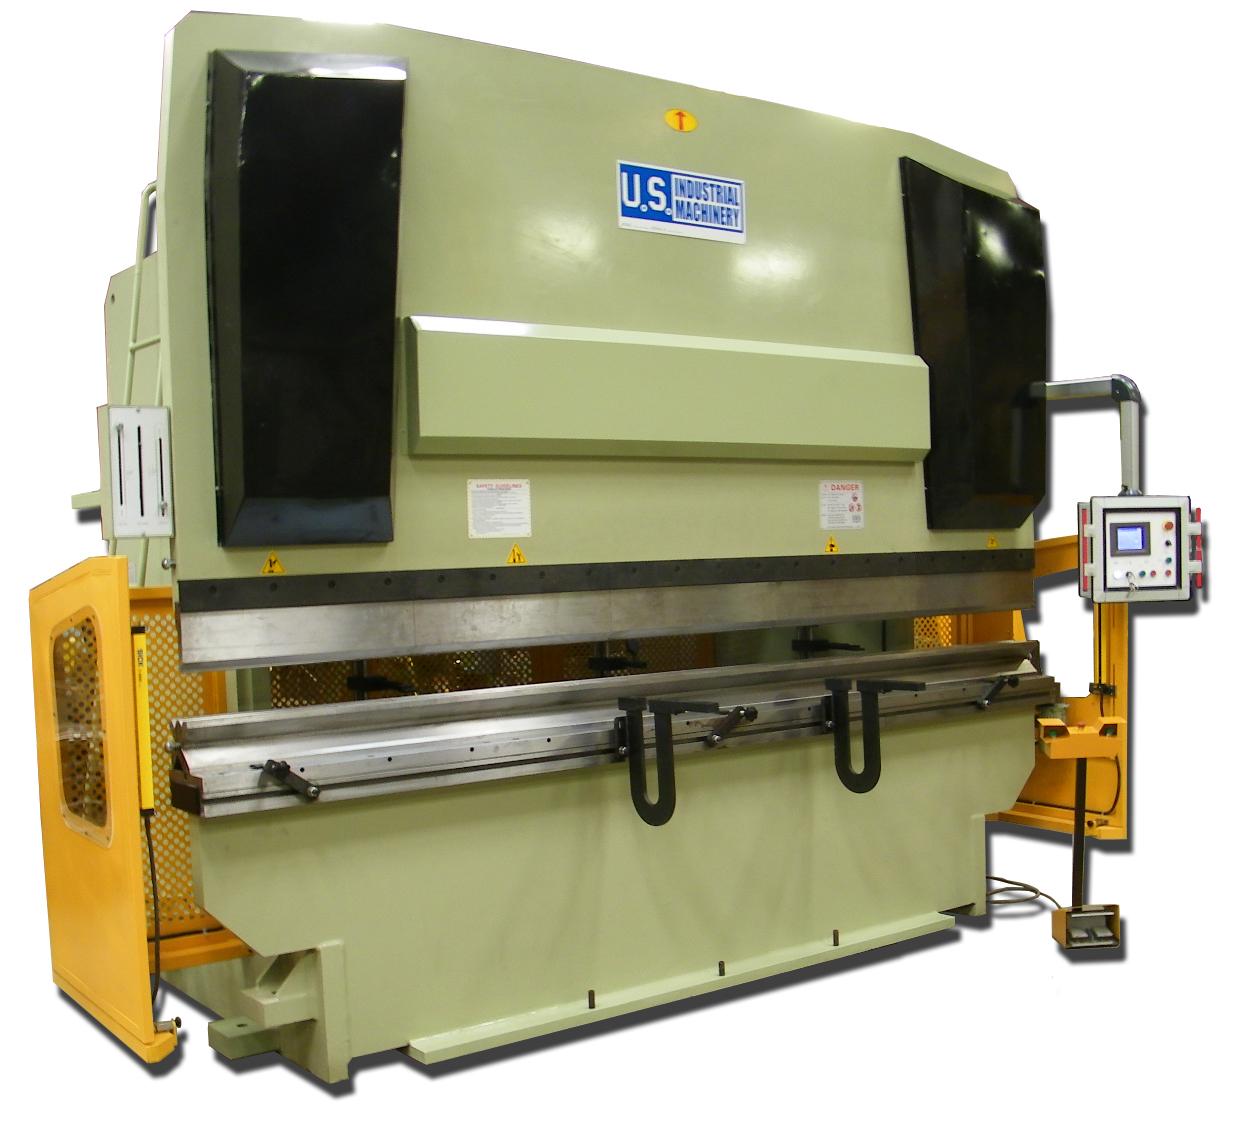 NEW 330 TON x 13' US INDUSTRIAL MODEL USHB330-13 CNC HYDRAULIC PRESS BRAKE WITH AUTO CROWN